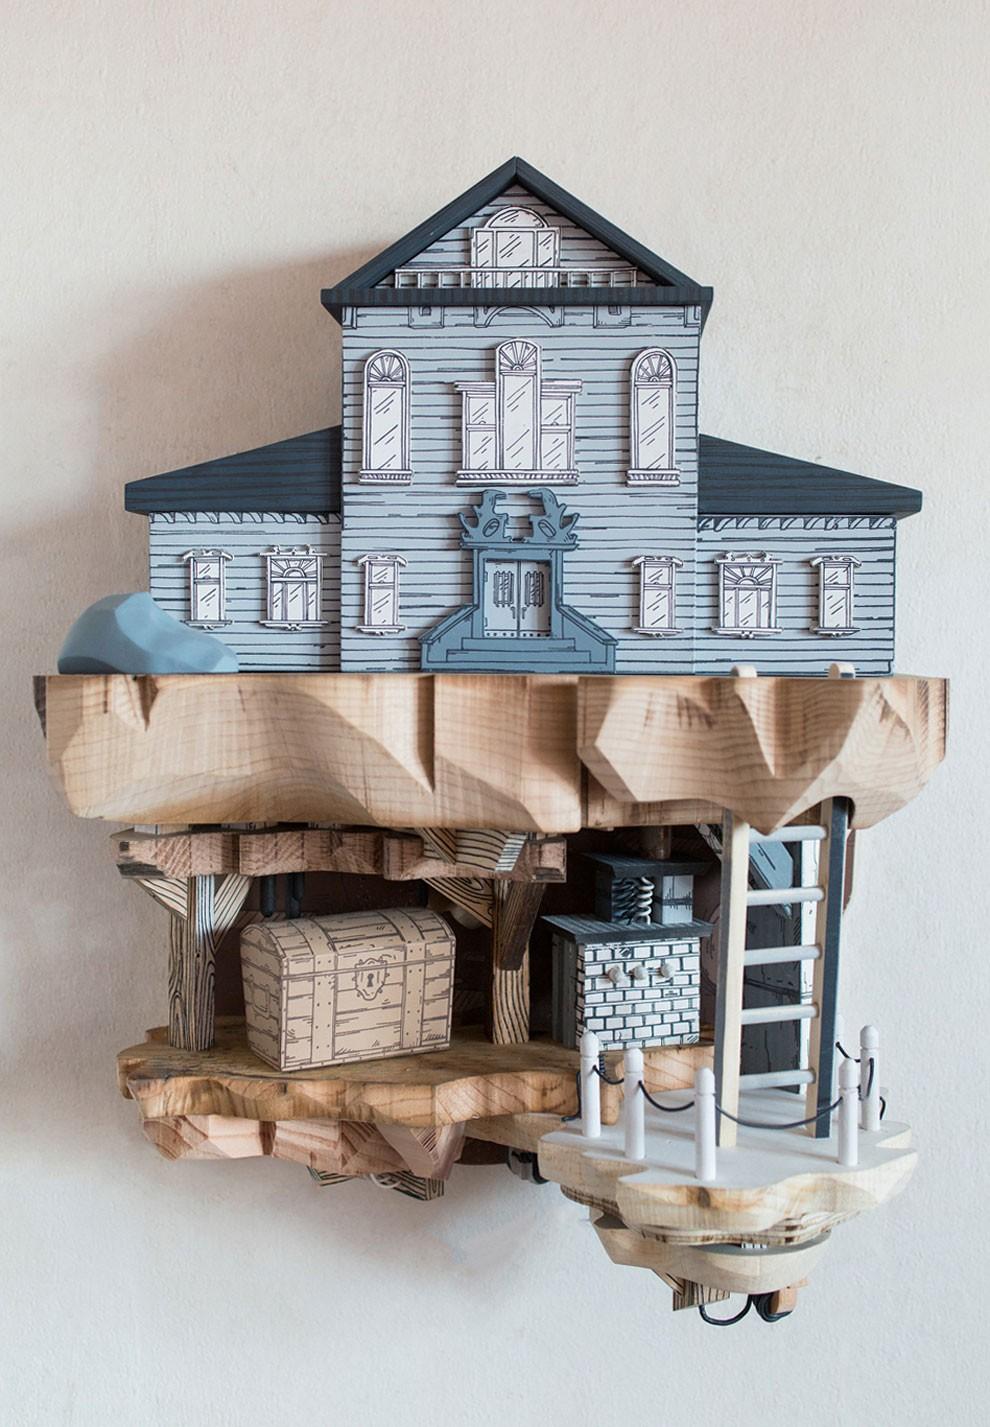 illustrazioni-scultura-mondi-miniatura-architettura-luke-o-sullivan-10